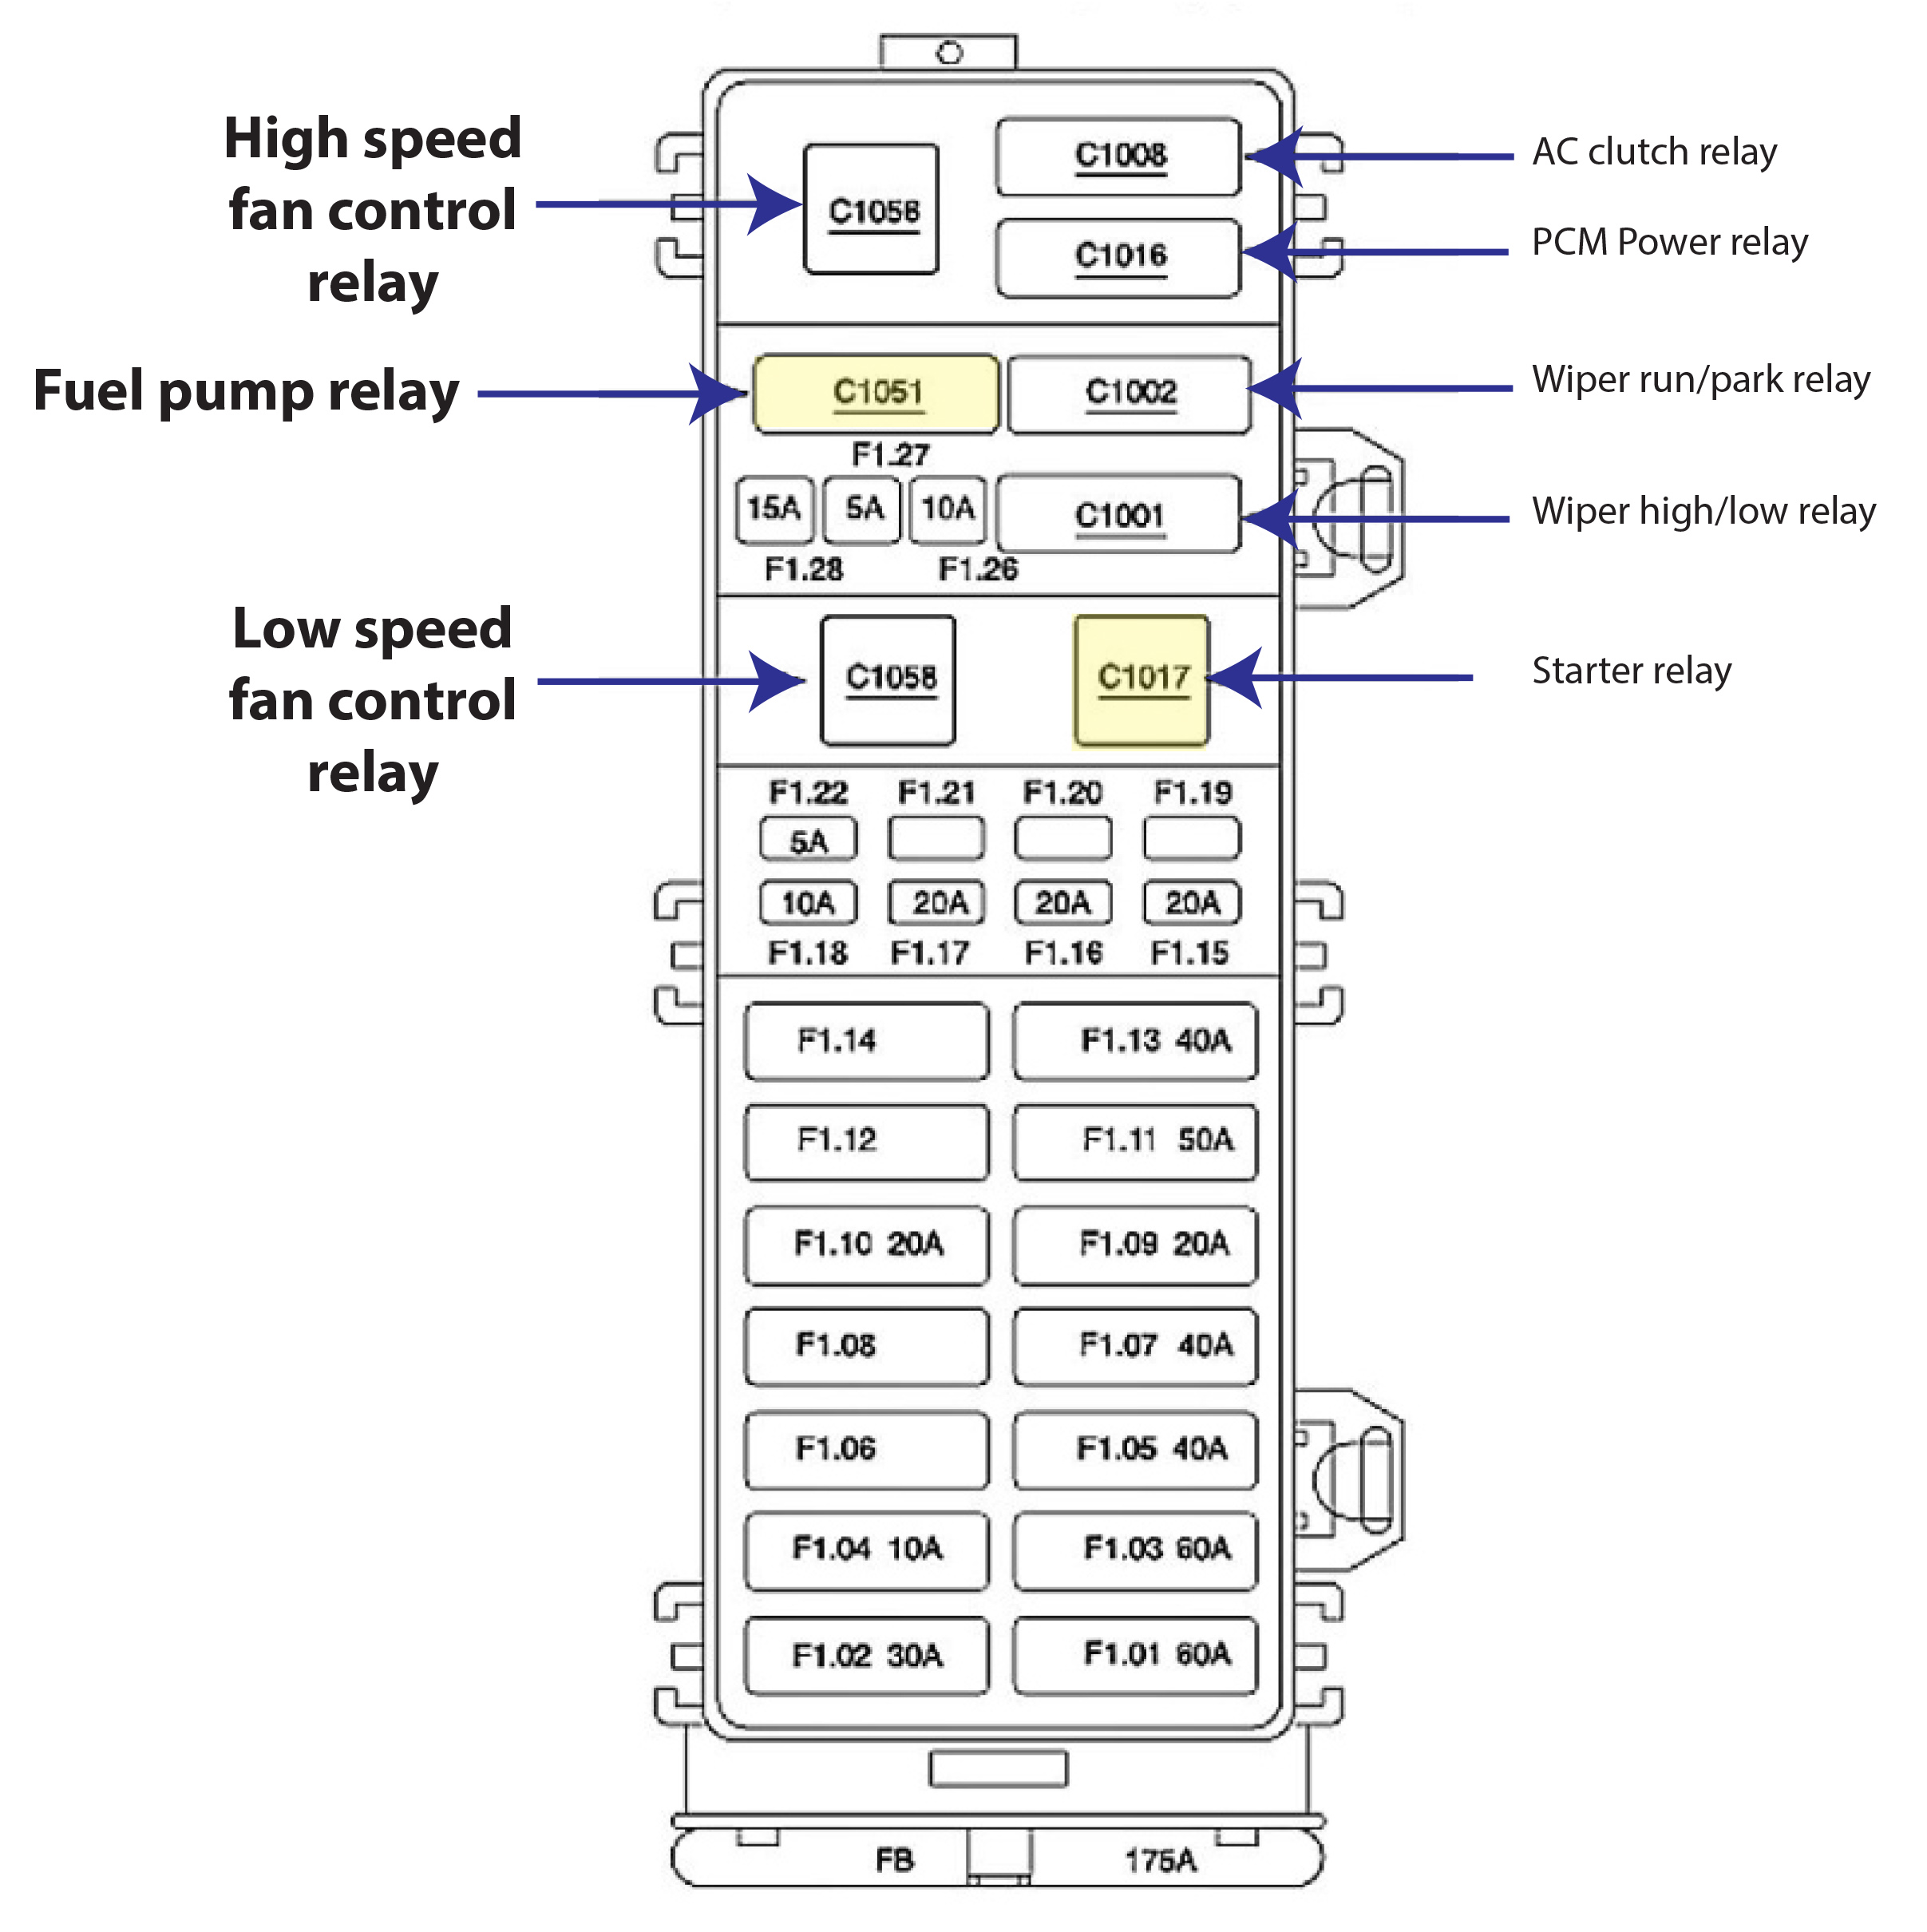 1993 ford f350 fuse diagram 1993 ford taurus fuse diagram wiring diagram e7  1993 ford taurus fuse diagram wiring